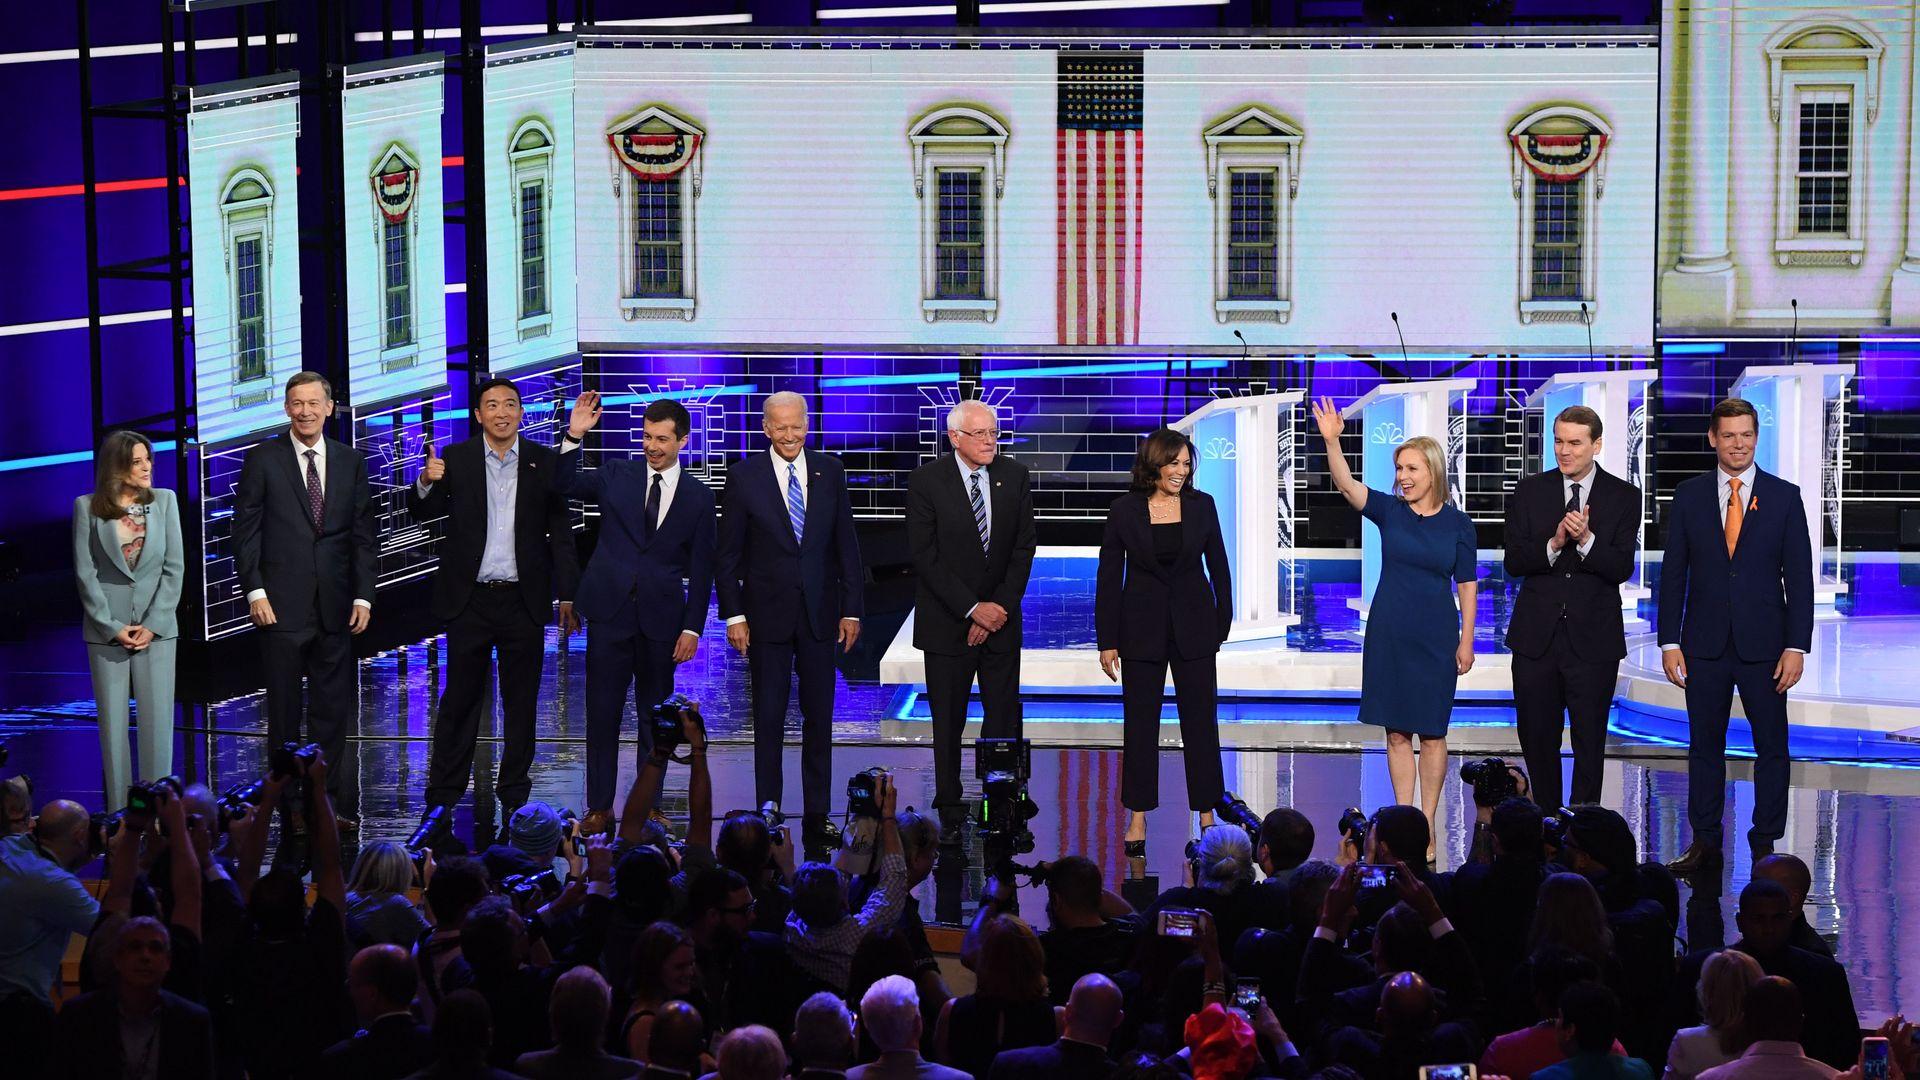 Democratic presidential hopefuls on the debate stage